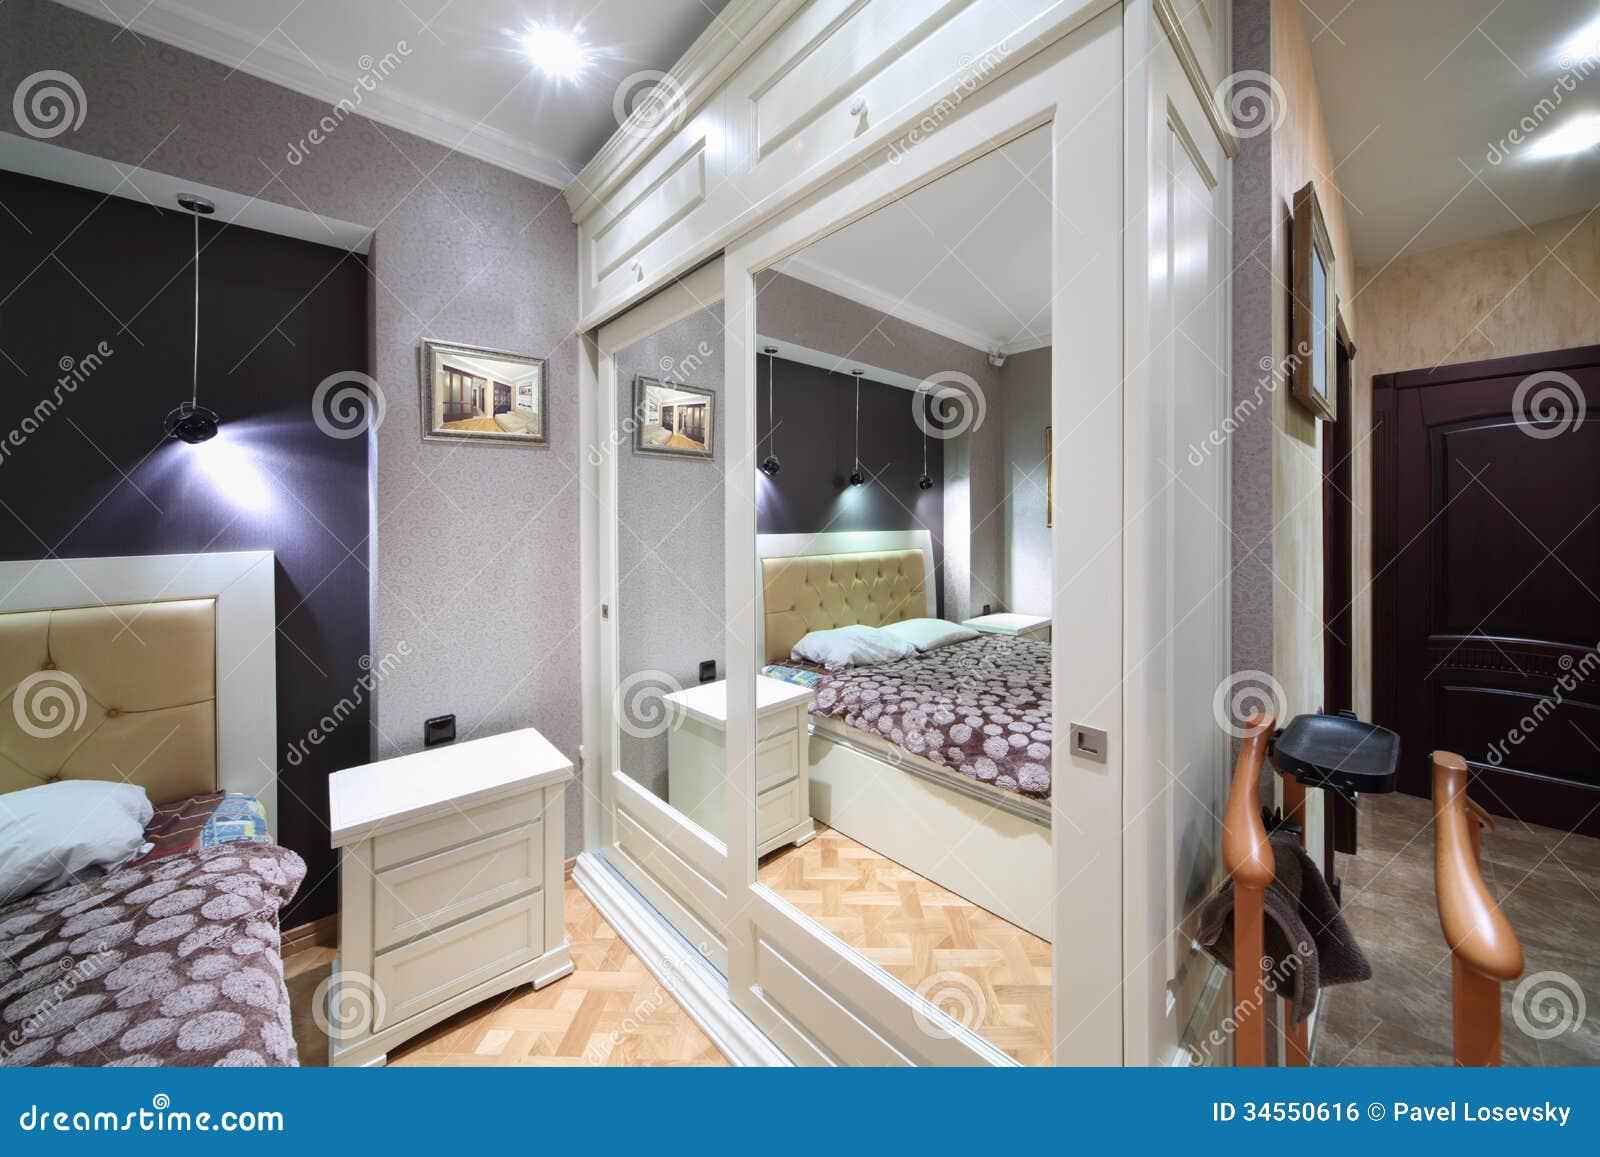 Built in White Wardrobe With Mirrored Doors In Bedroom